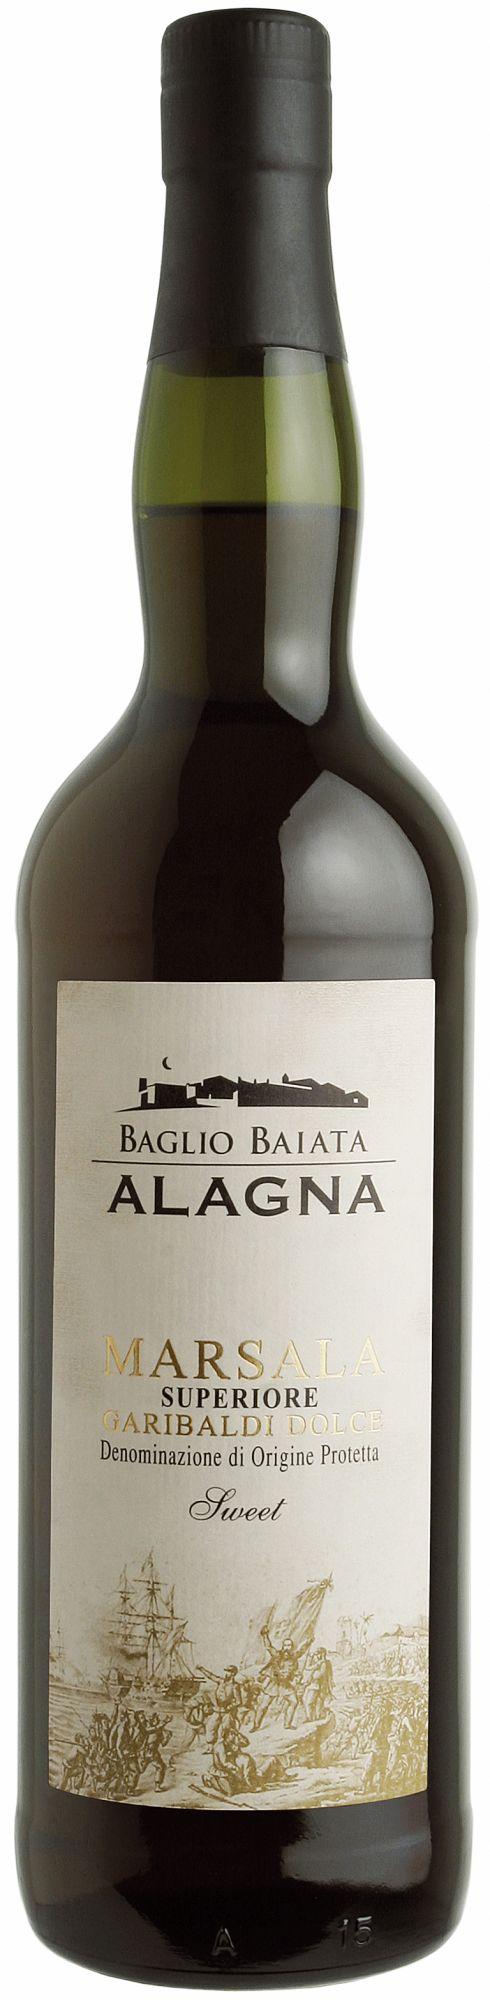 Marsala Superiore Garibaldi Dolce, 2 years old, Baglio Baiata Alagna